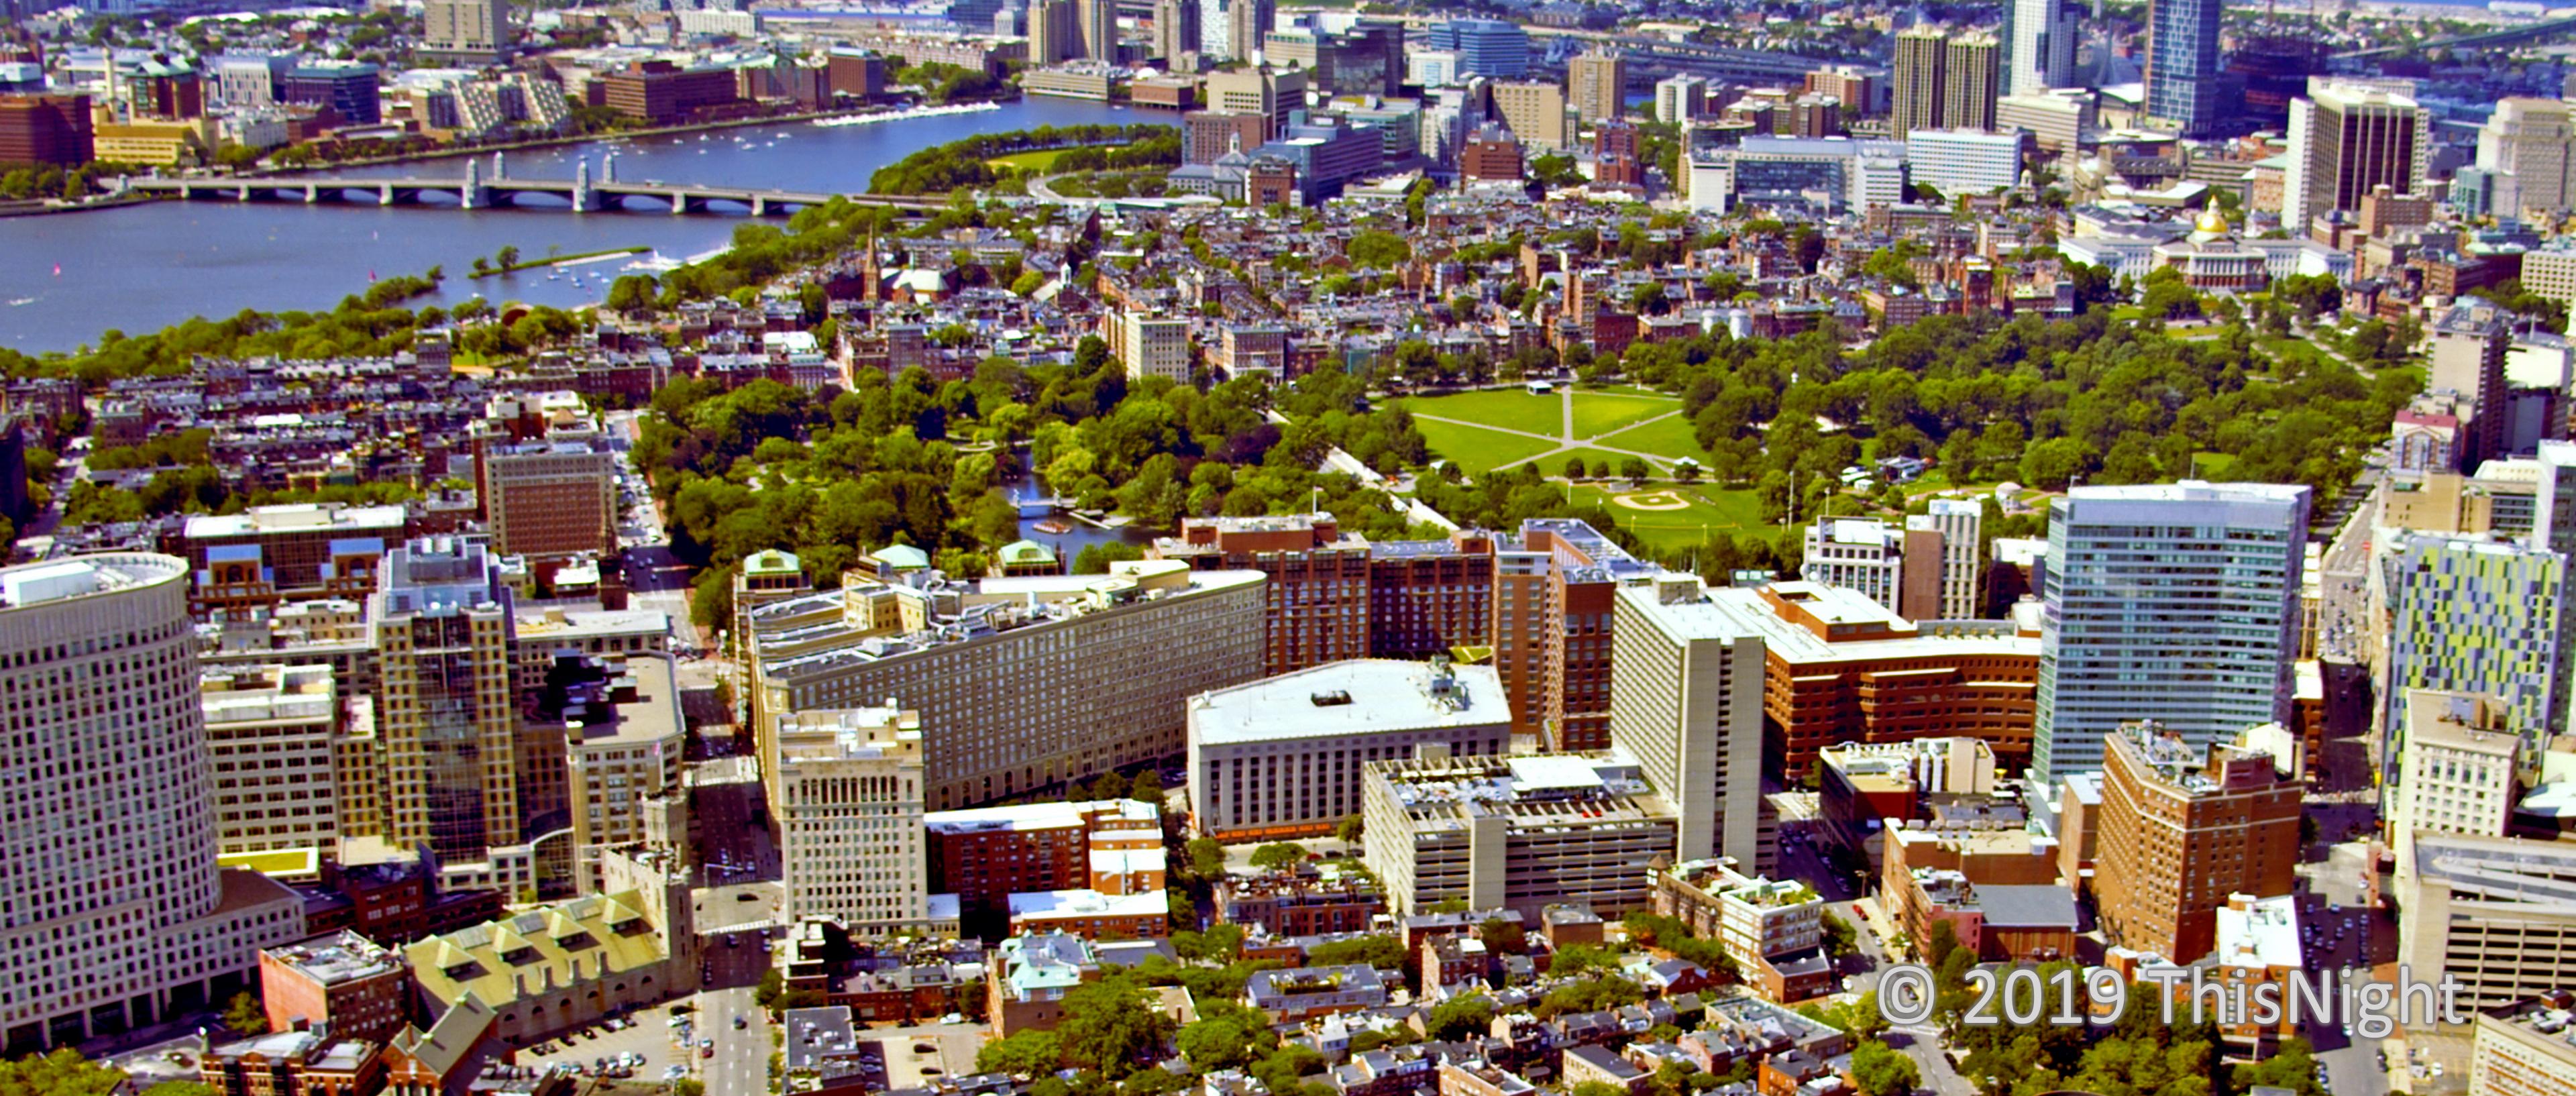 Introduction of Boston_00176